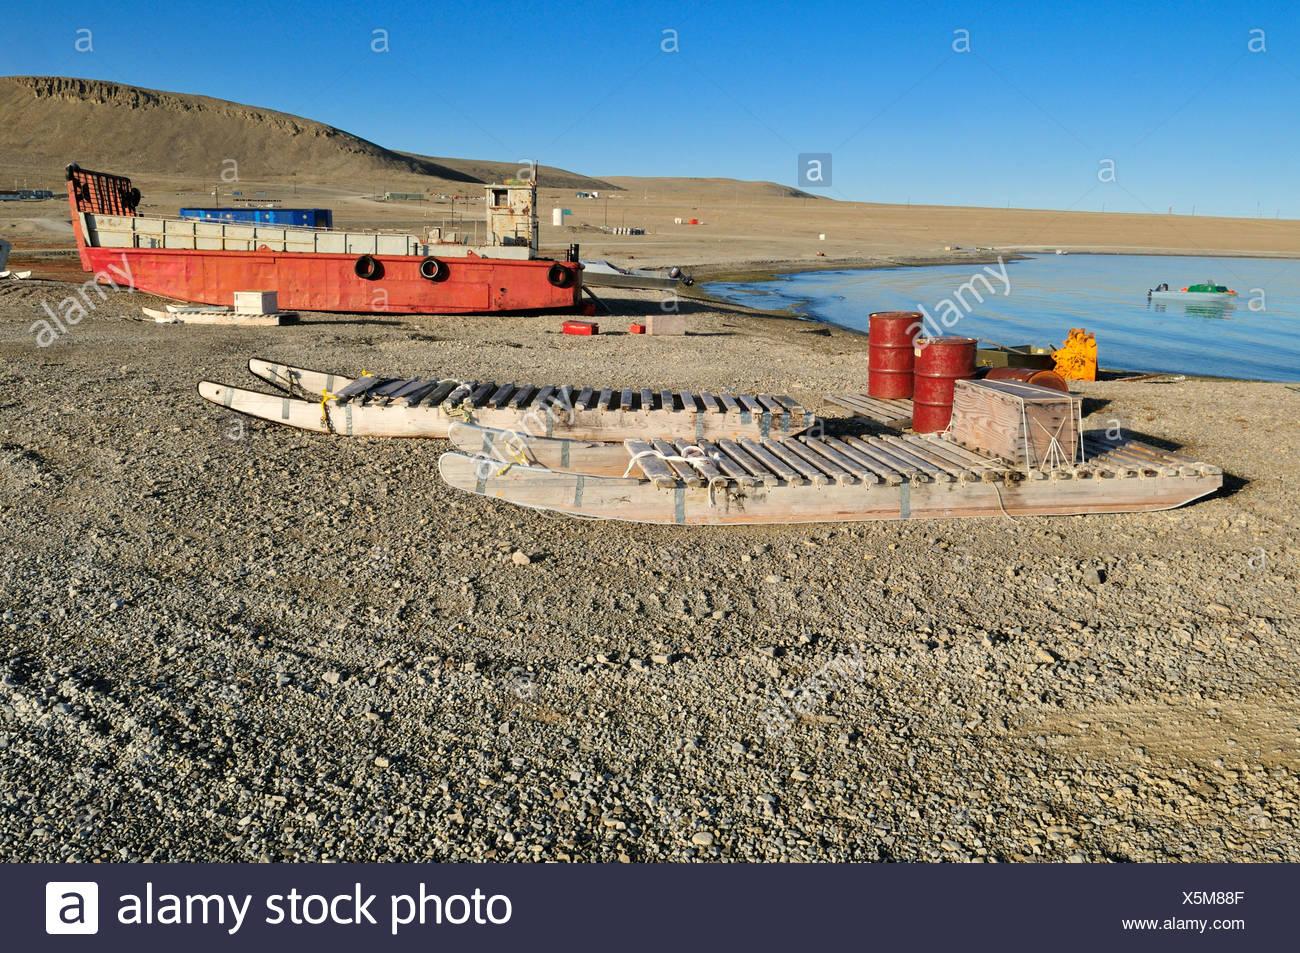 Harbour of the Inuit community Resolute Bay, Cornwallis Island, Northwest Passage, Nunavut, Canada, Arctic - Stock Image